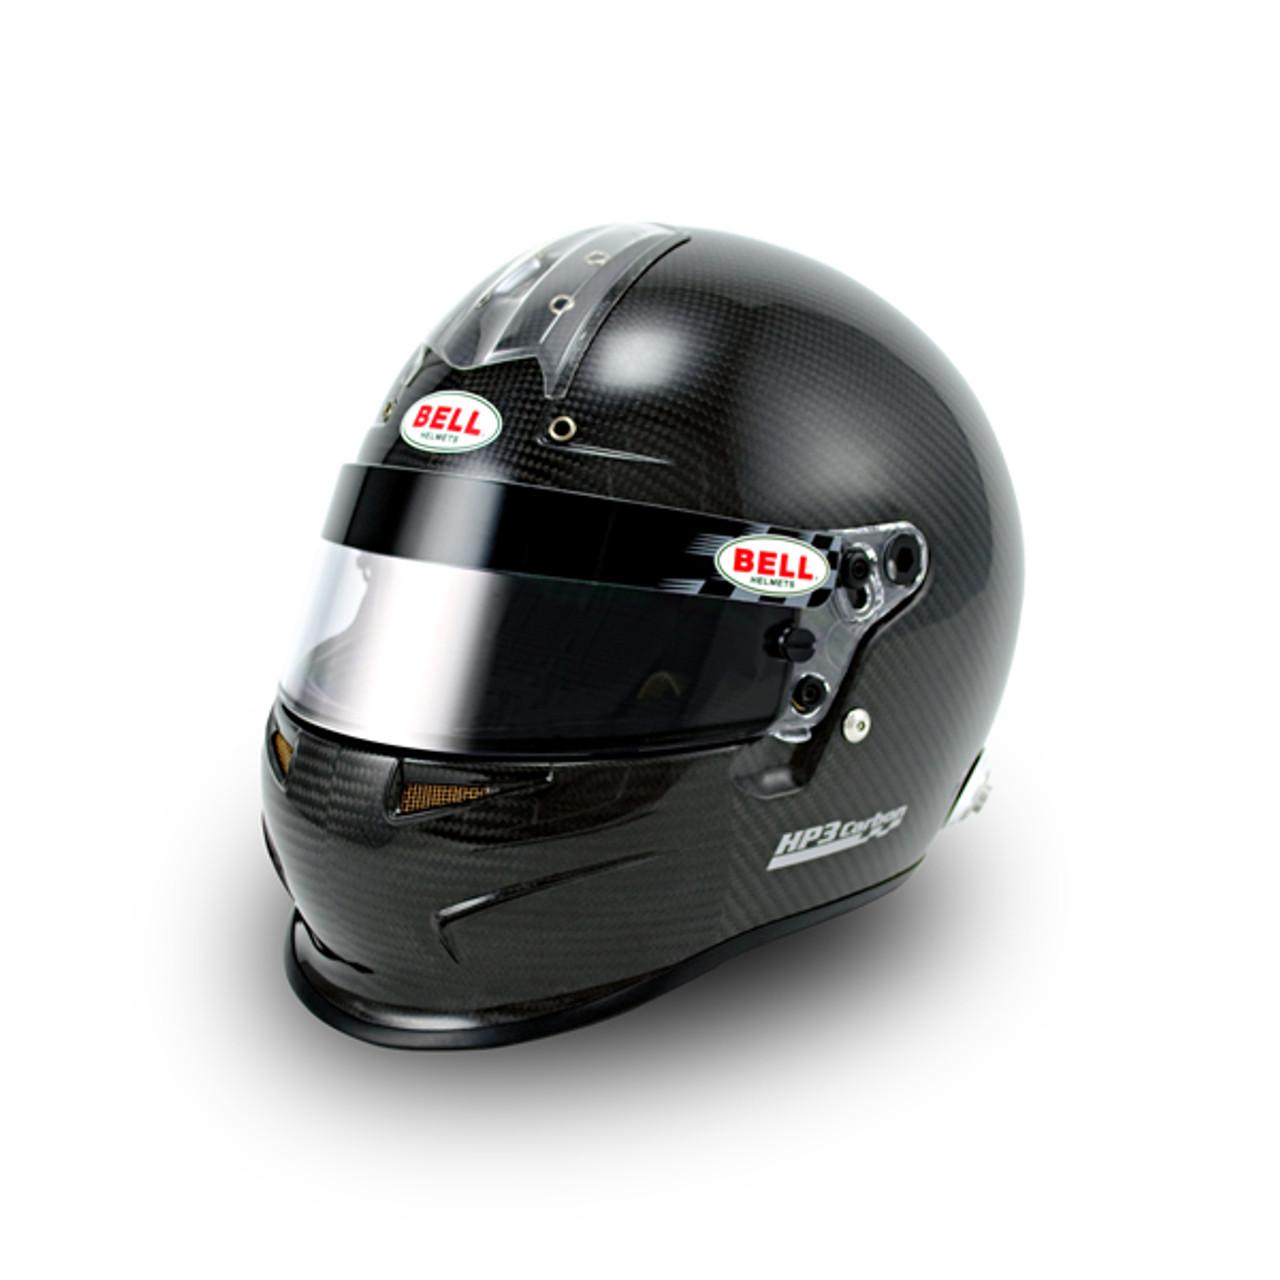 Bell Racing Helmets >> Bell Hp3 Automotive Ultra Series Helmet